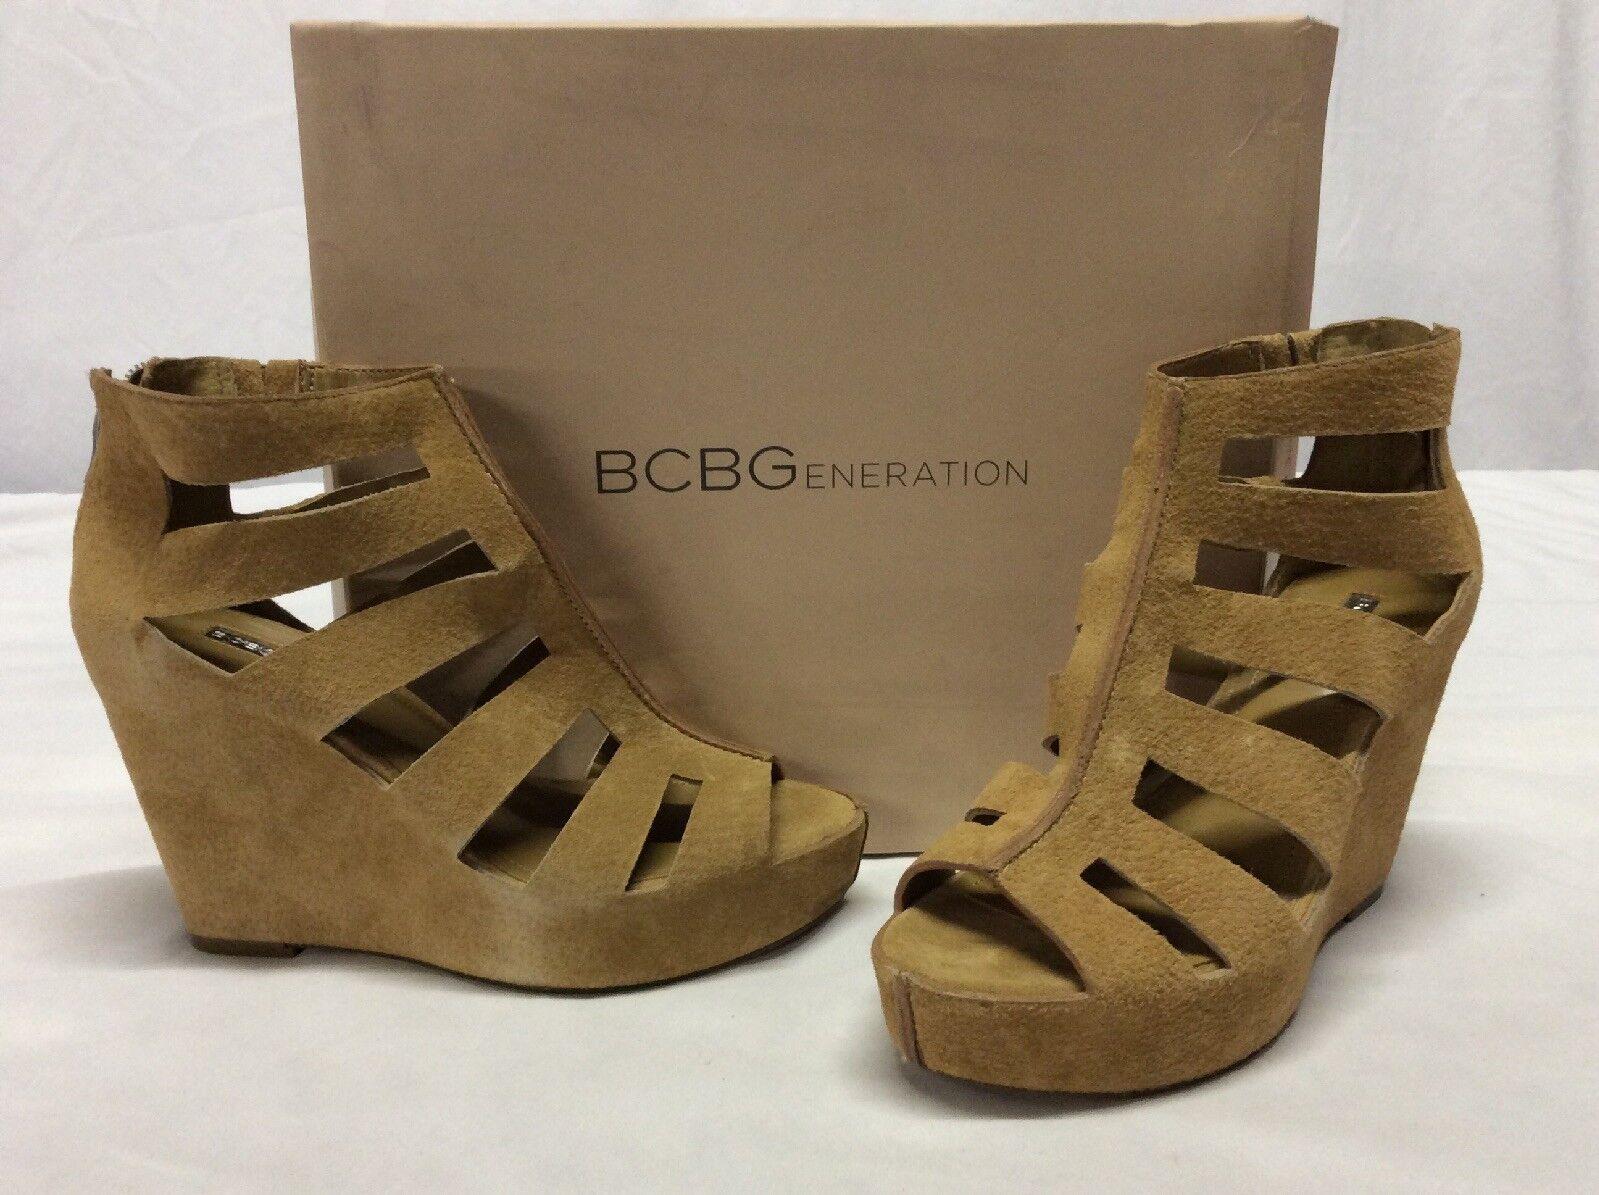 Bcbgeeneration Torrez Mujer Cuña Sandalias, tan Learher, tamaño 8.5 M